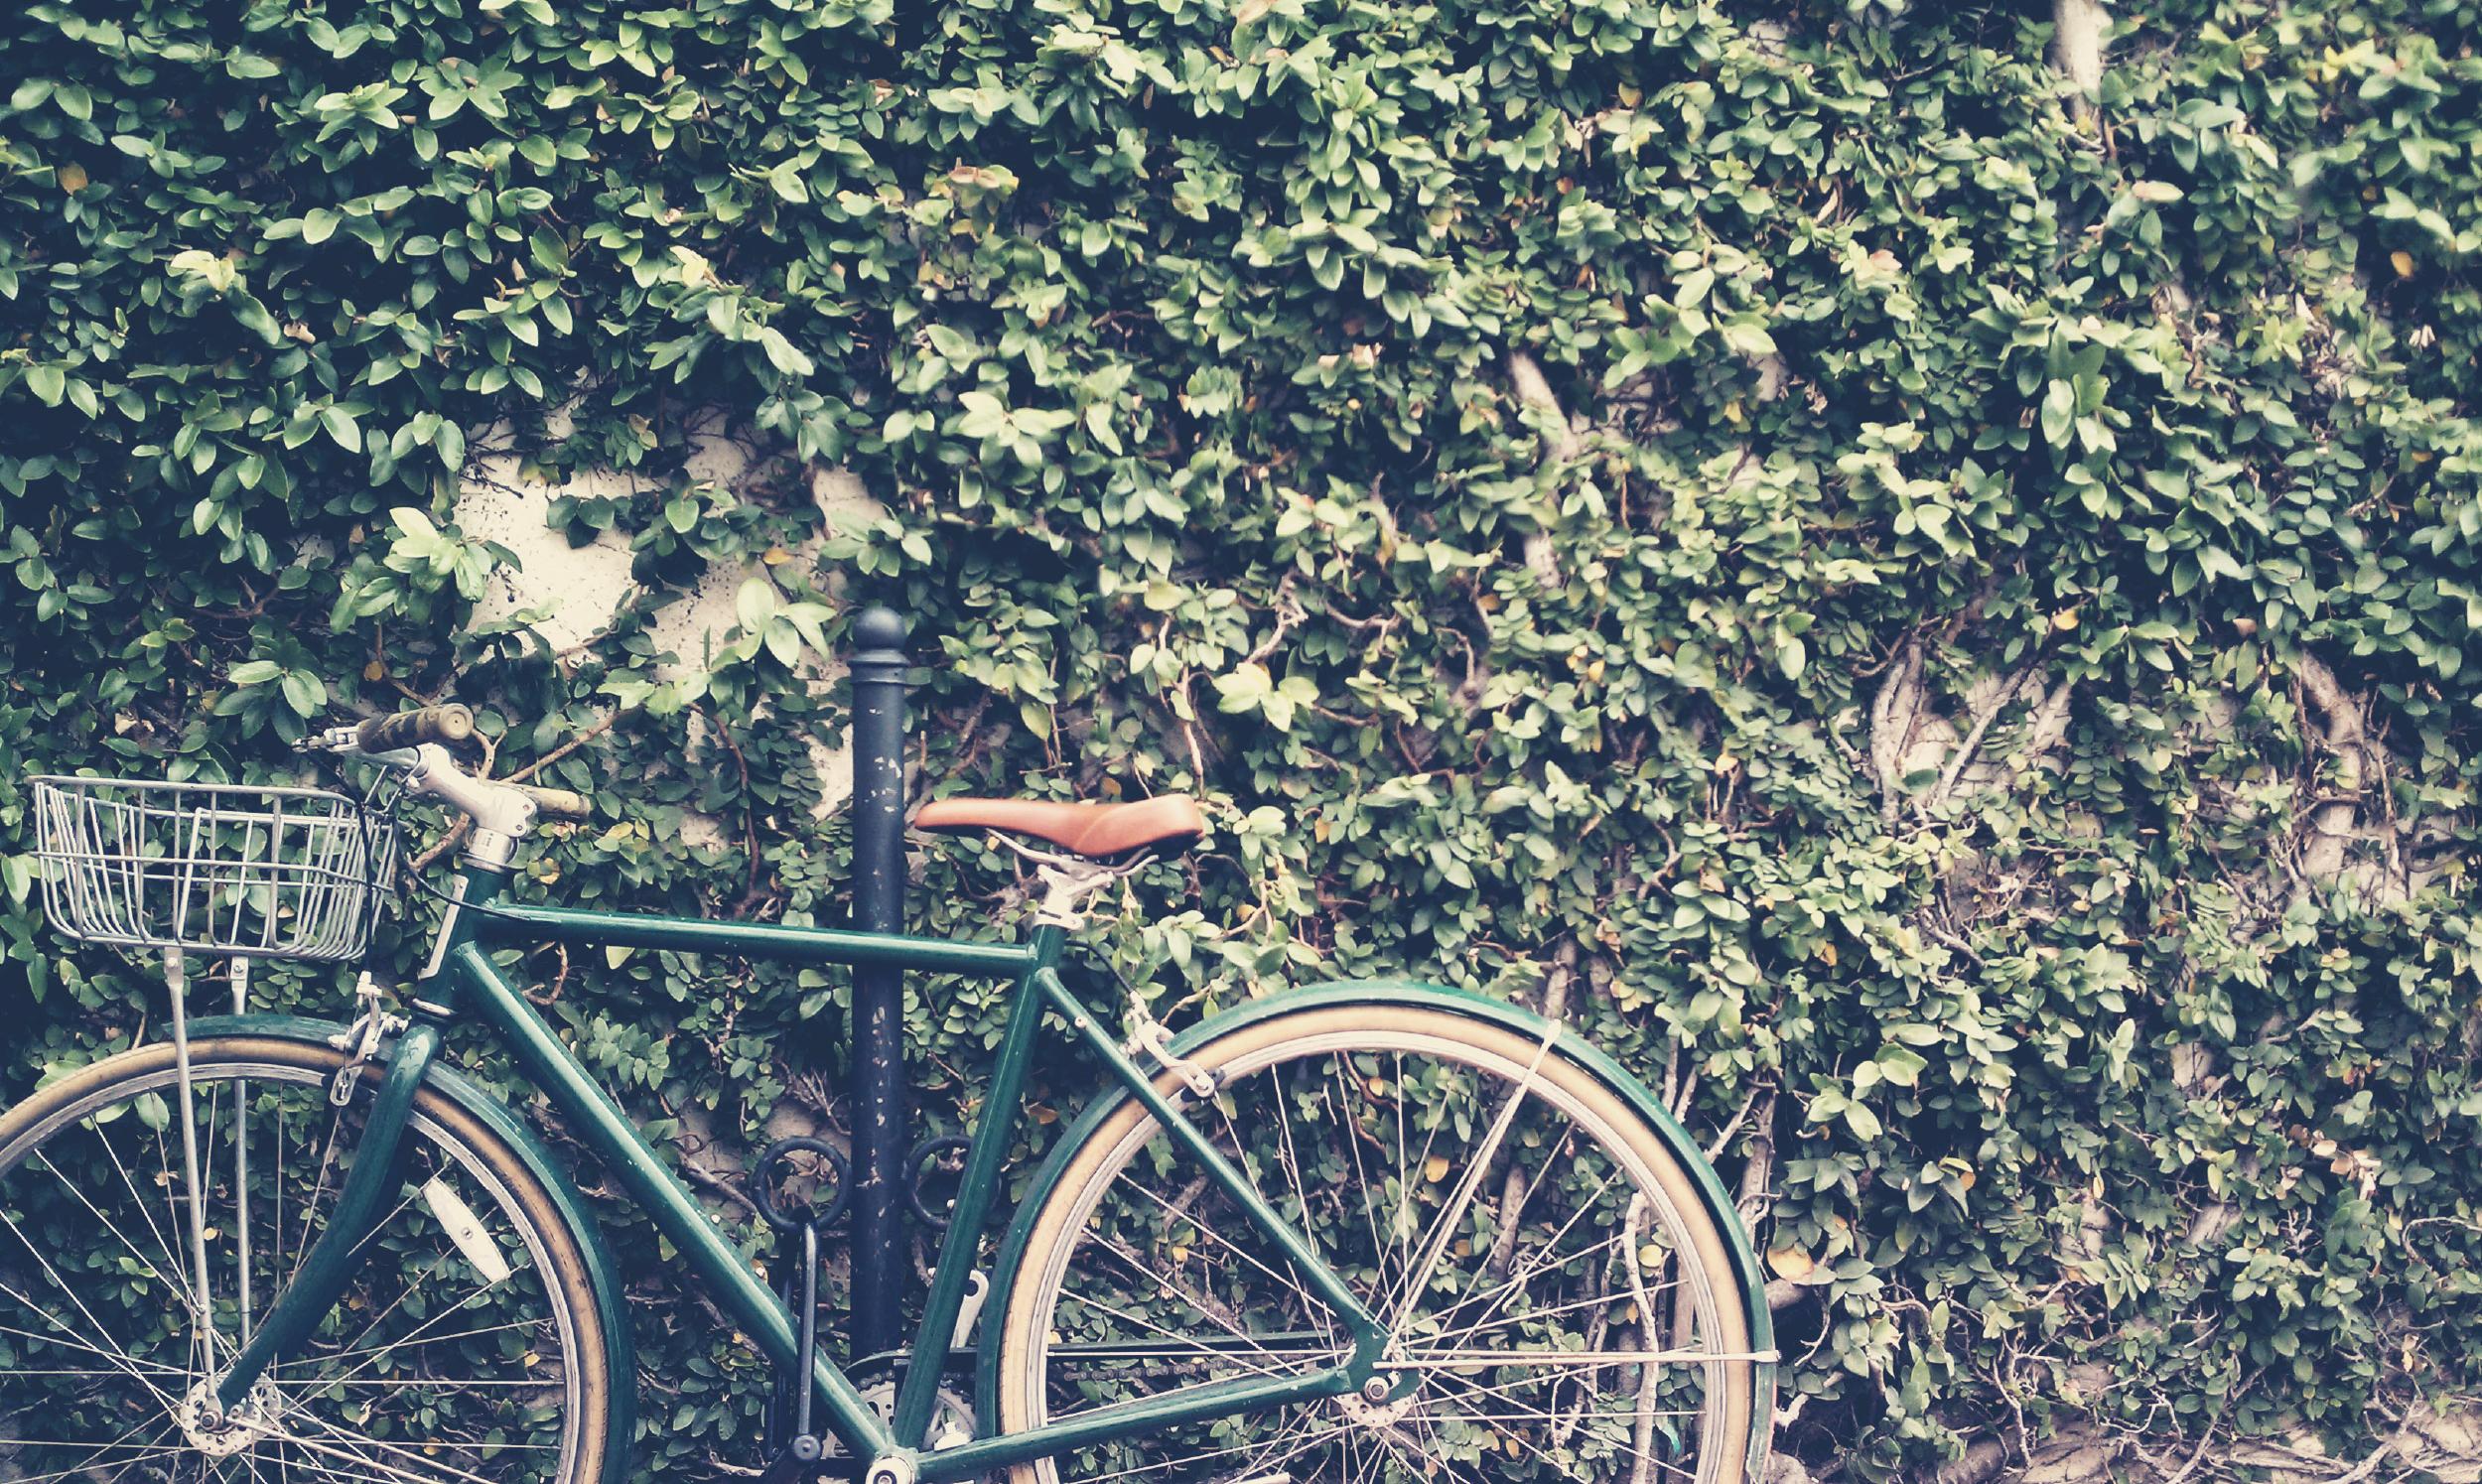 Bike with Ivy